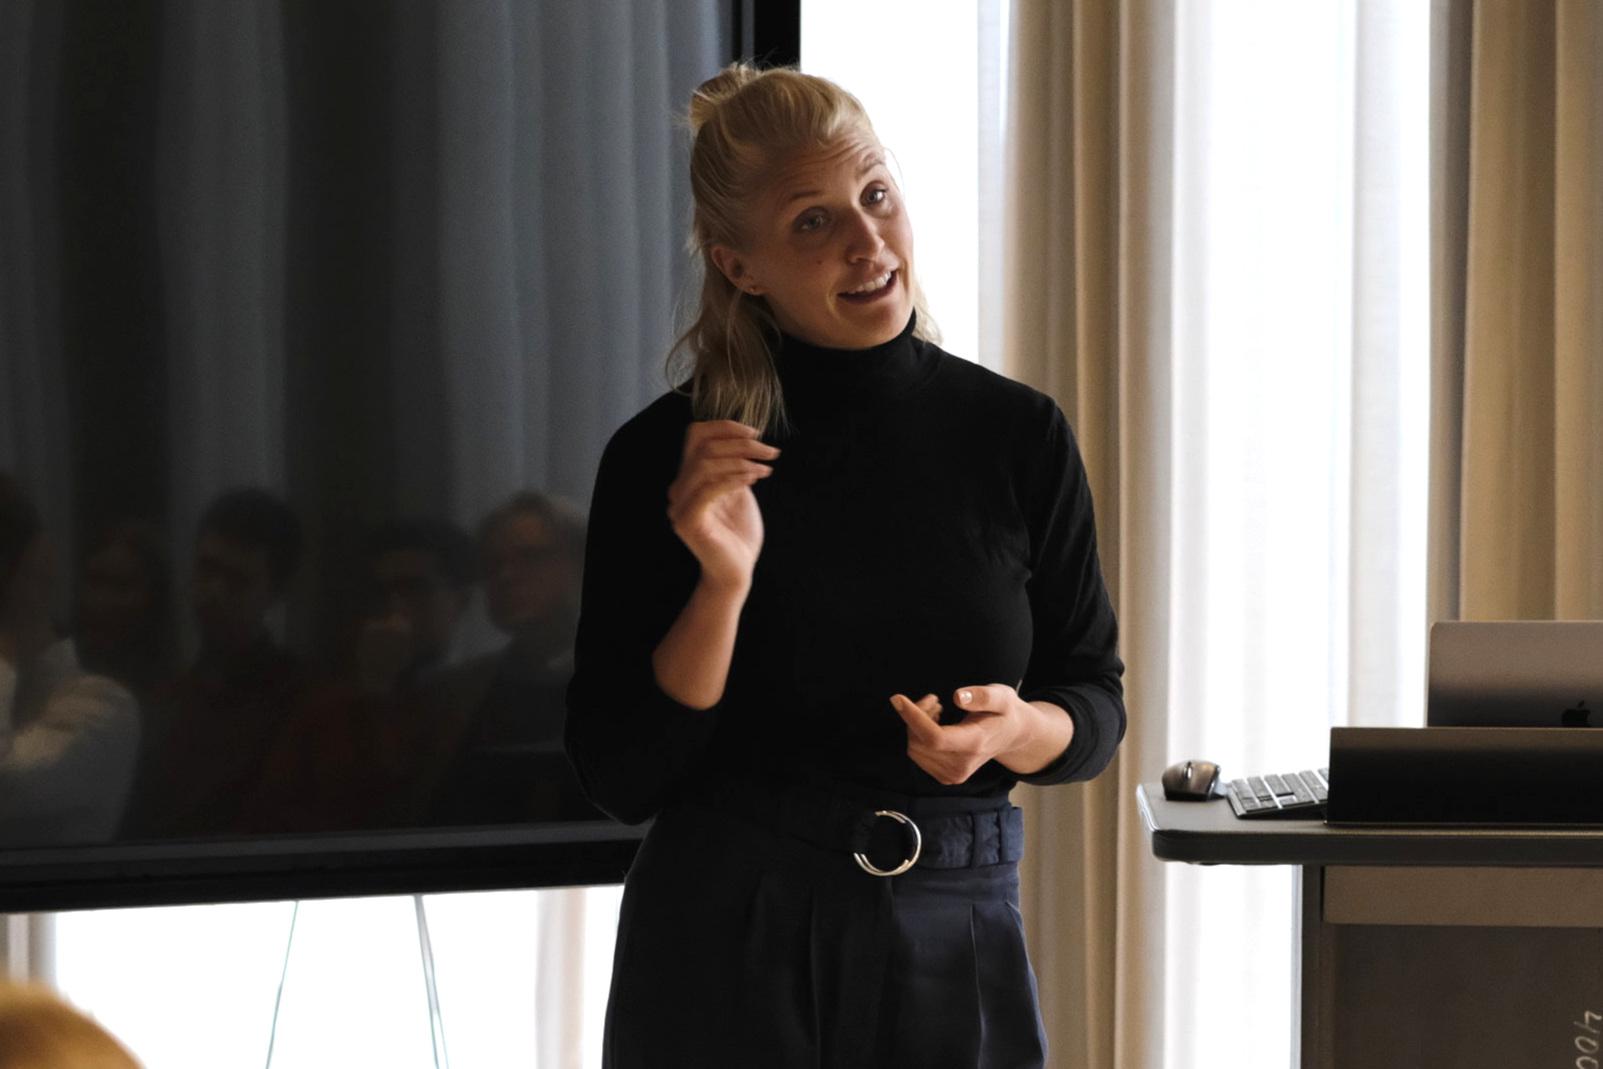 Kristina Løfman - MBA (Master of Business Administration)